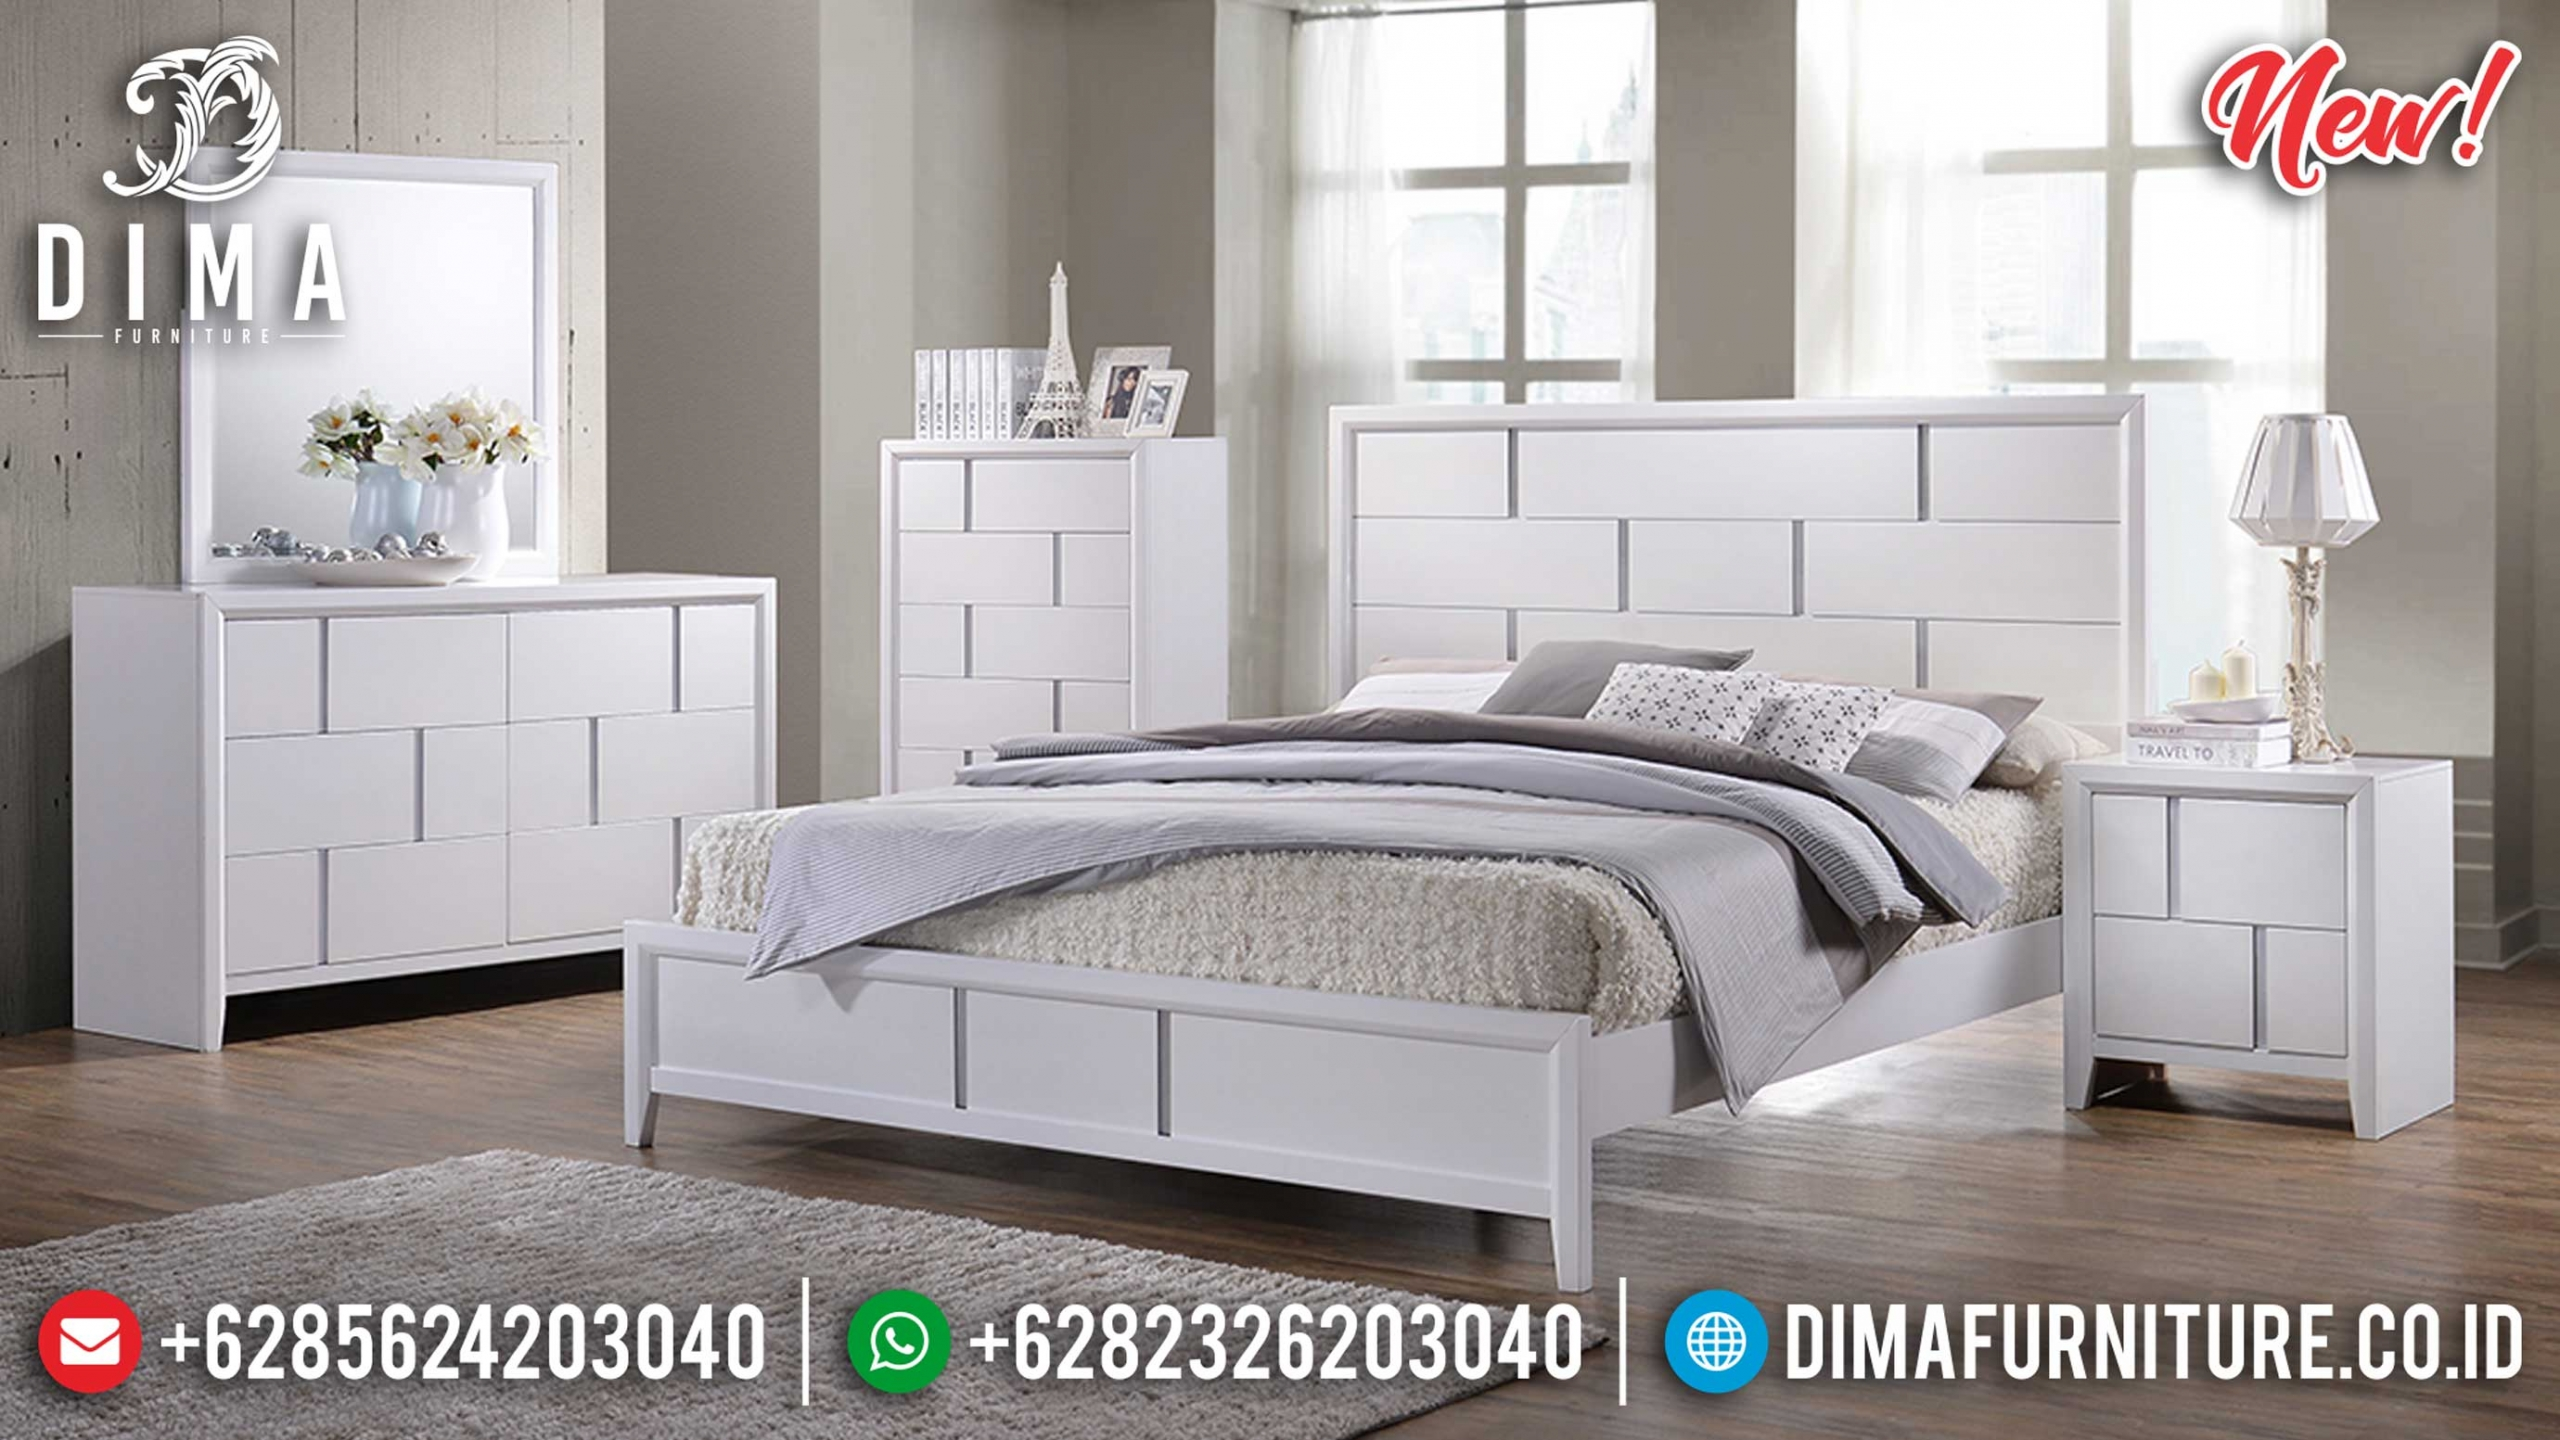 New Tempat Tidur Minimalis Puzzle Design Modern Luxury Jepara BT-0921